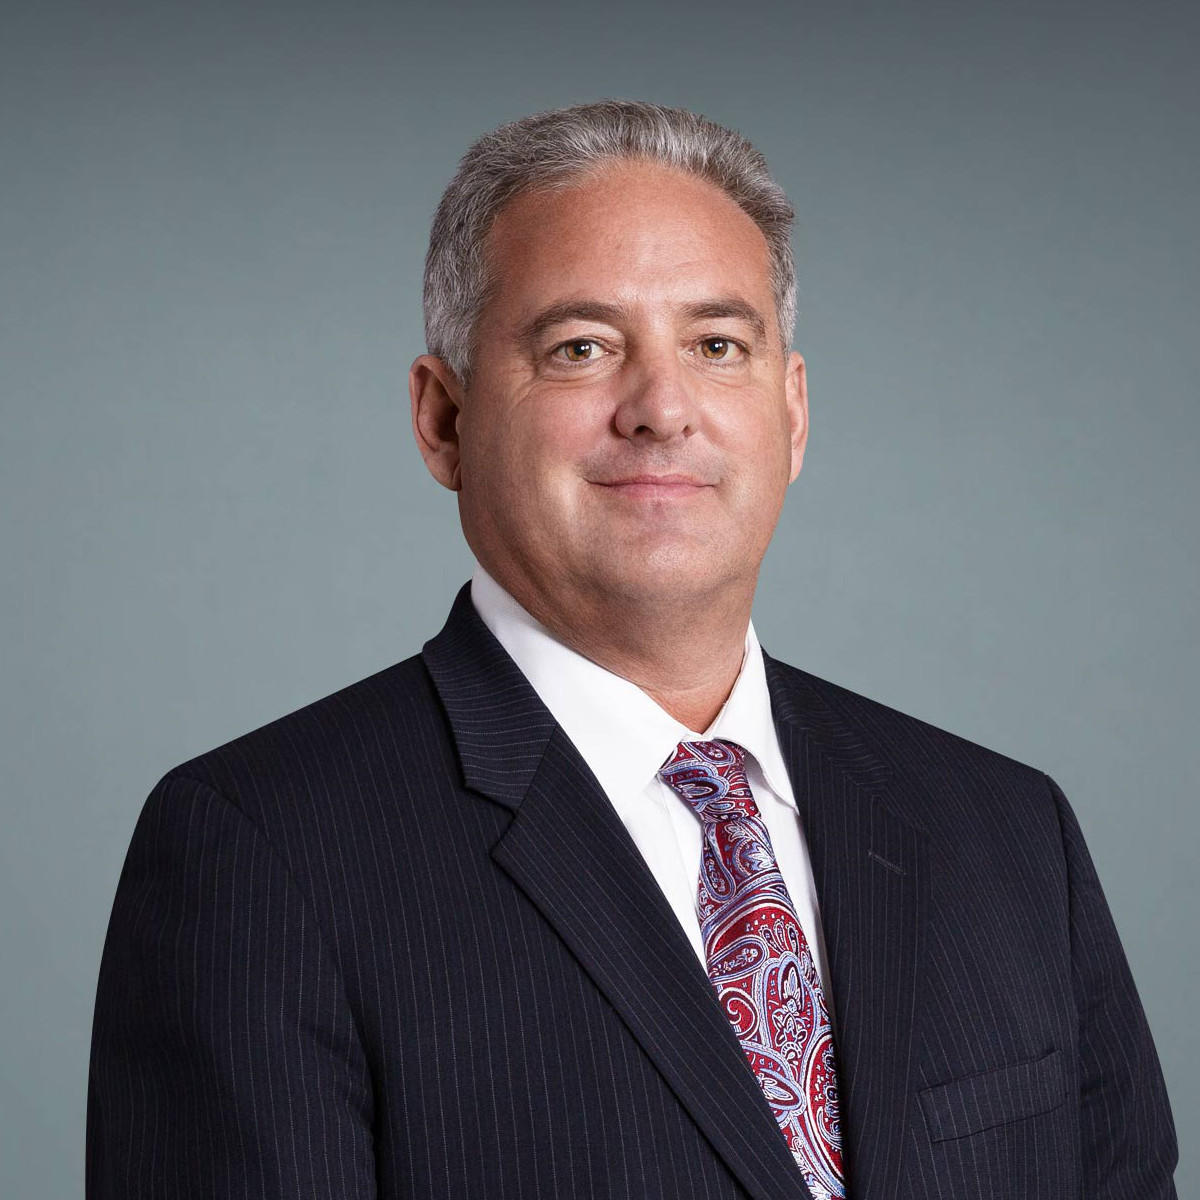 Douglas R. Lazzaro, MD